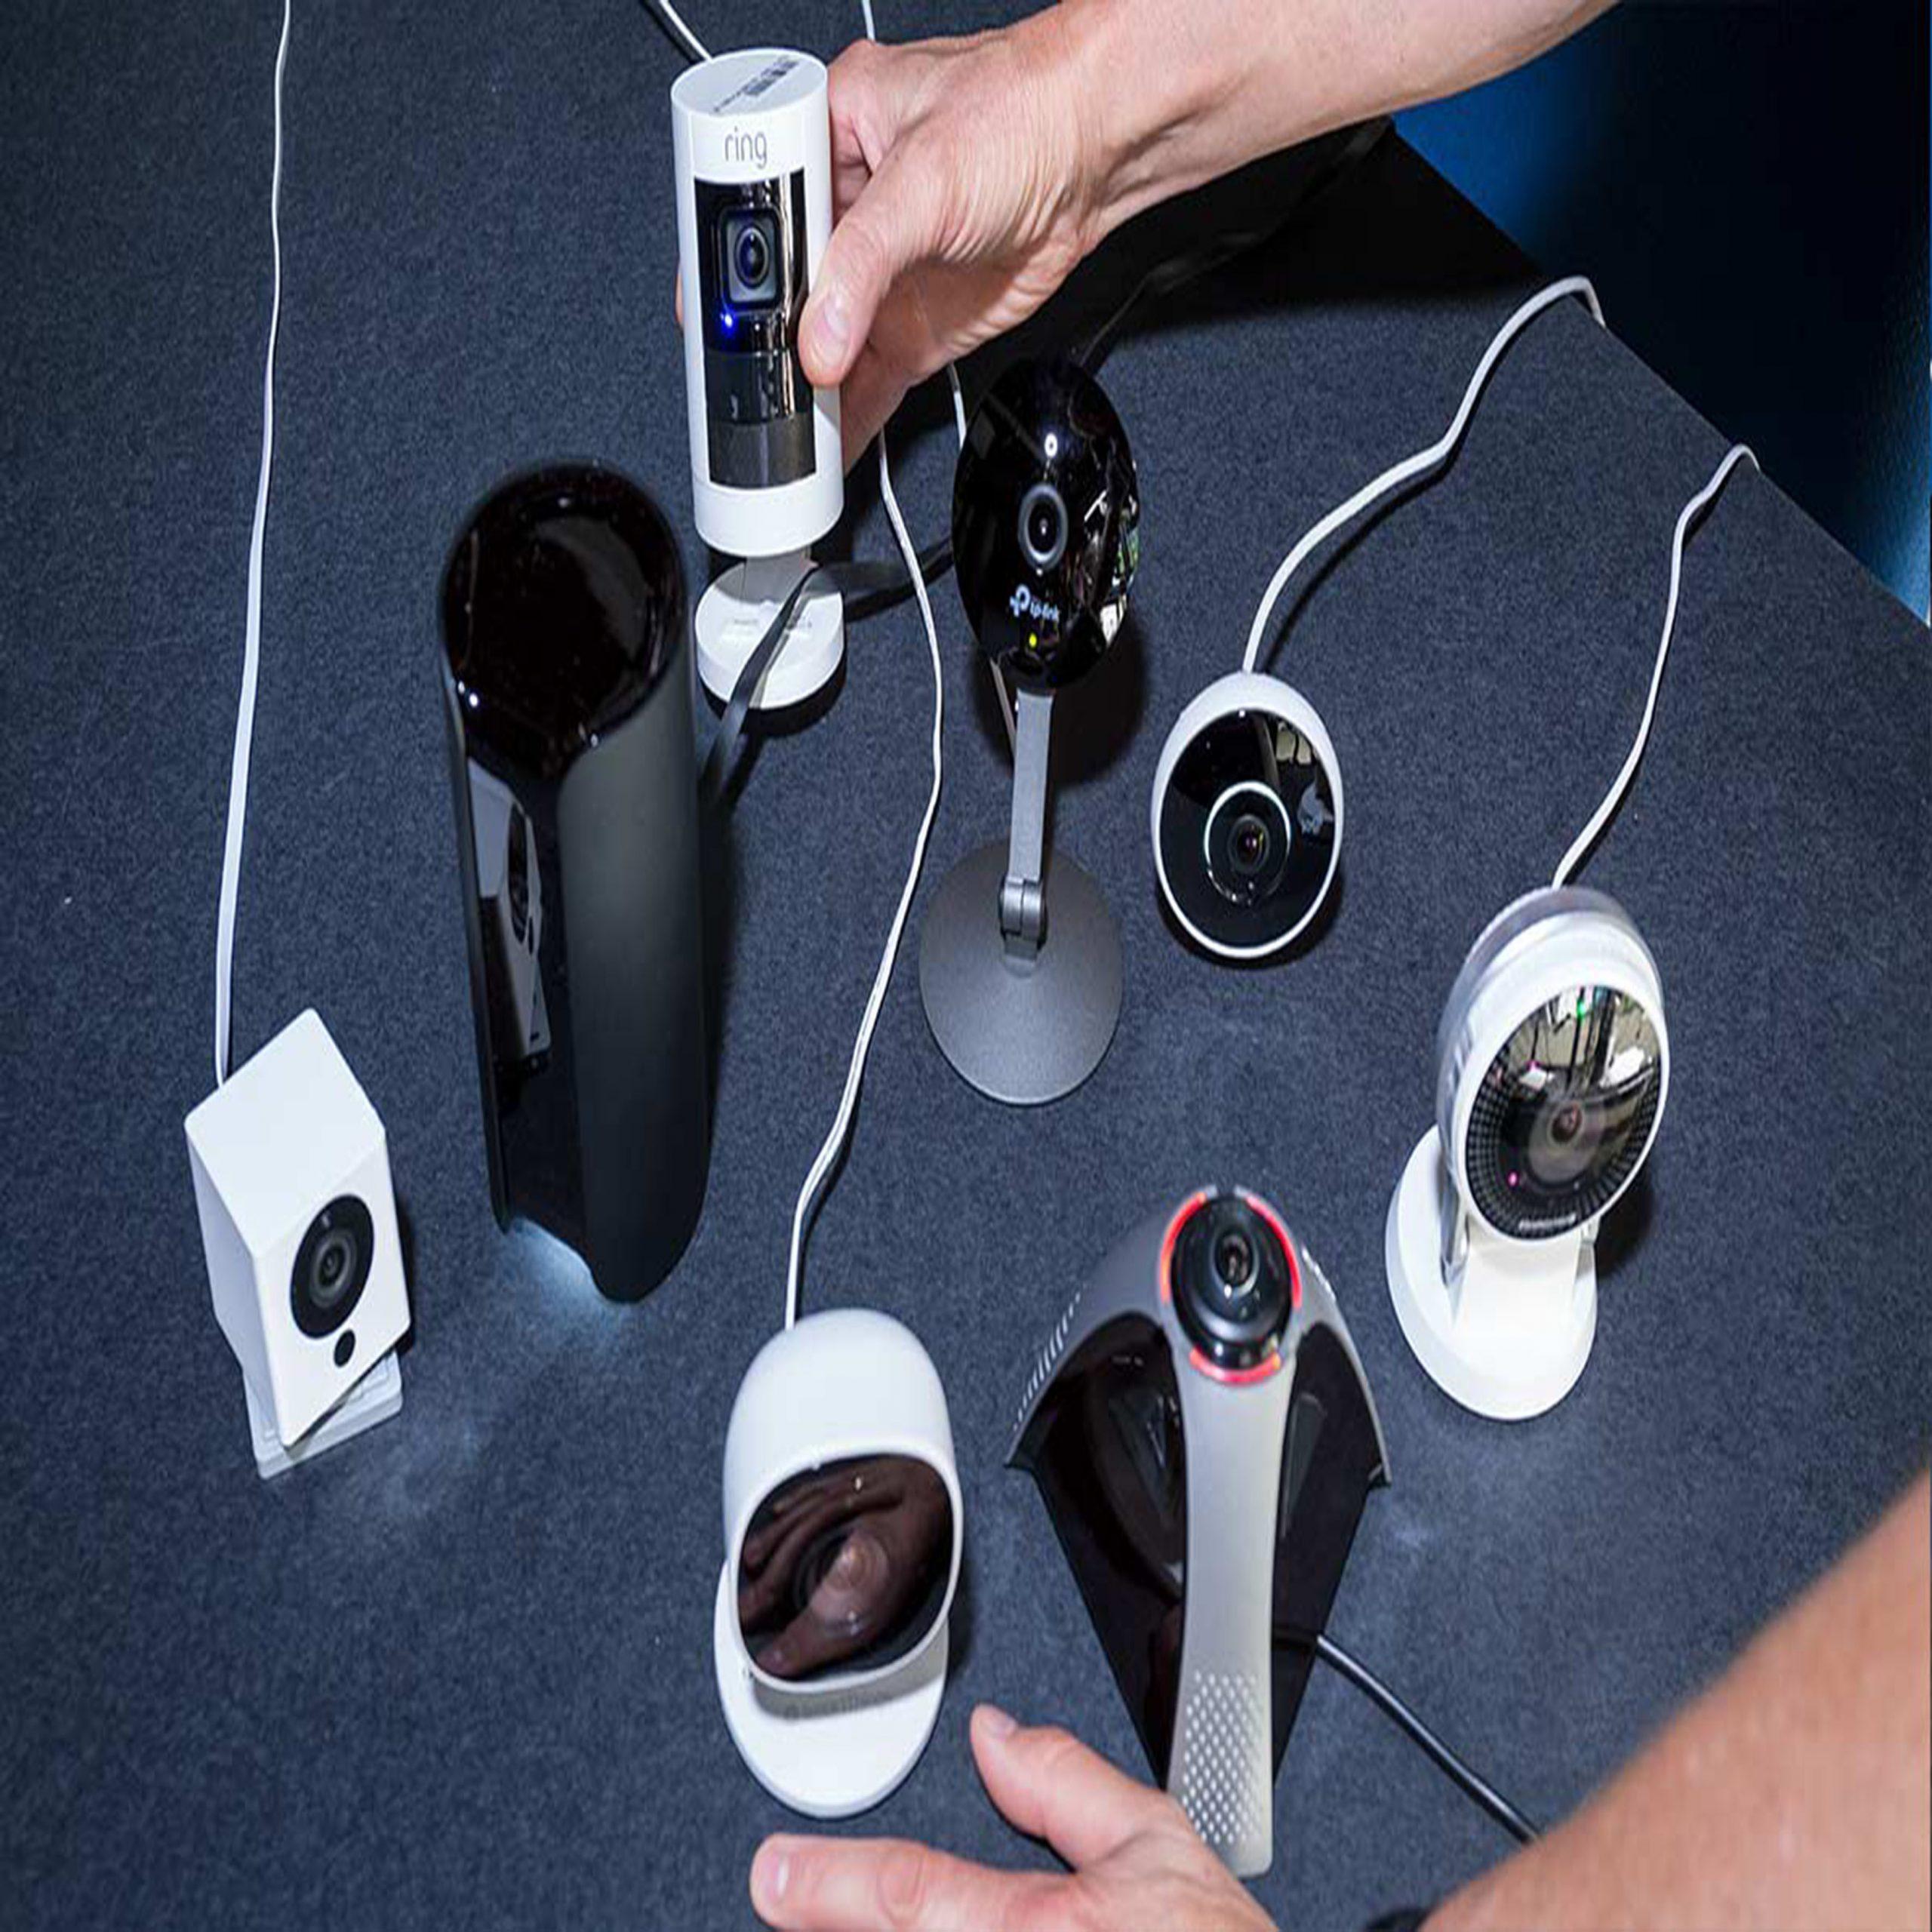 Bảo trì camera giám sát